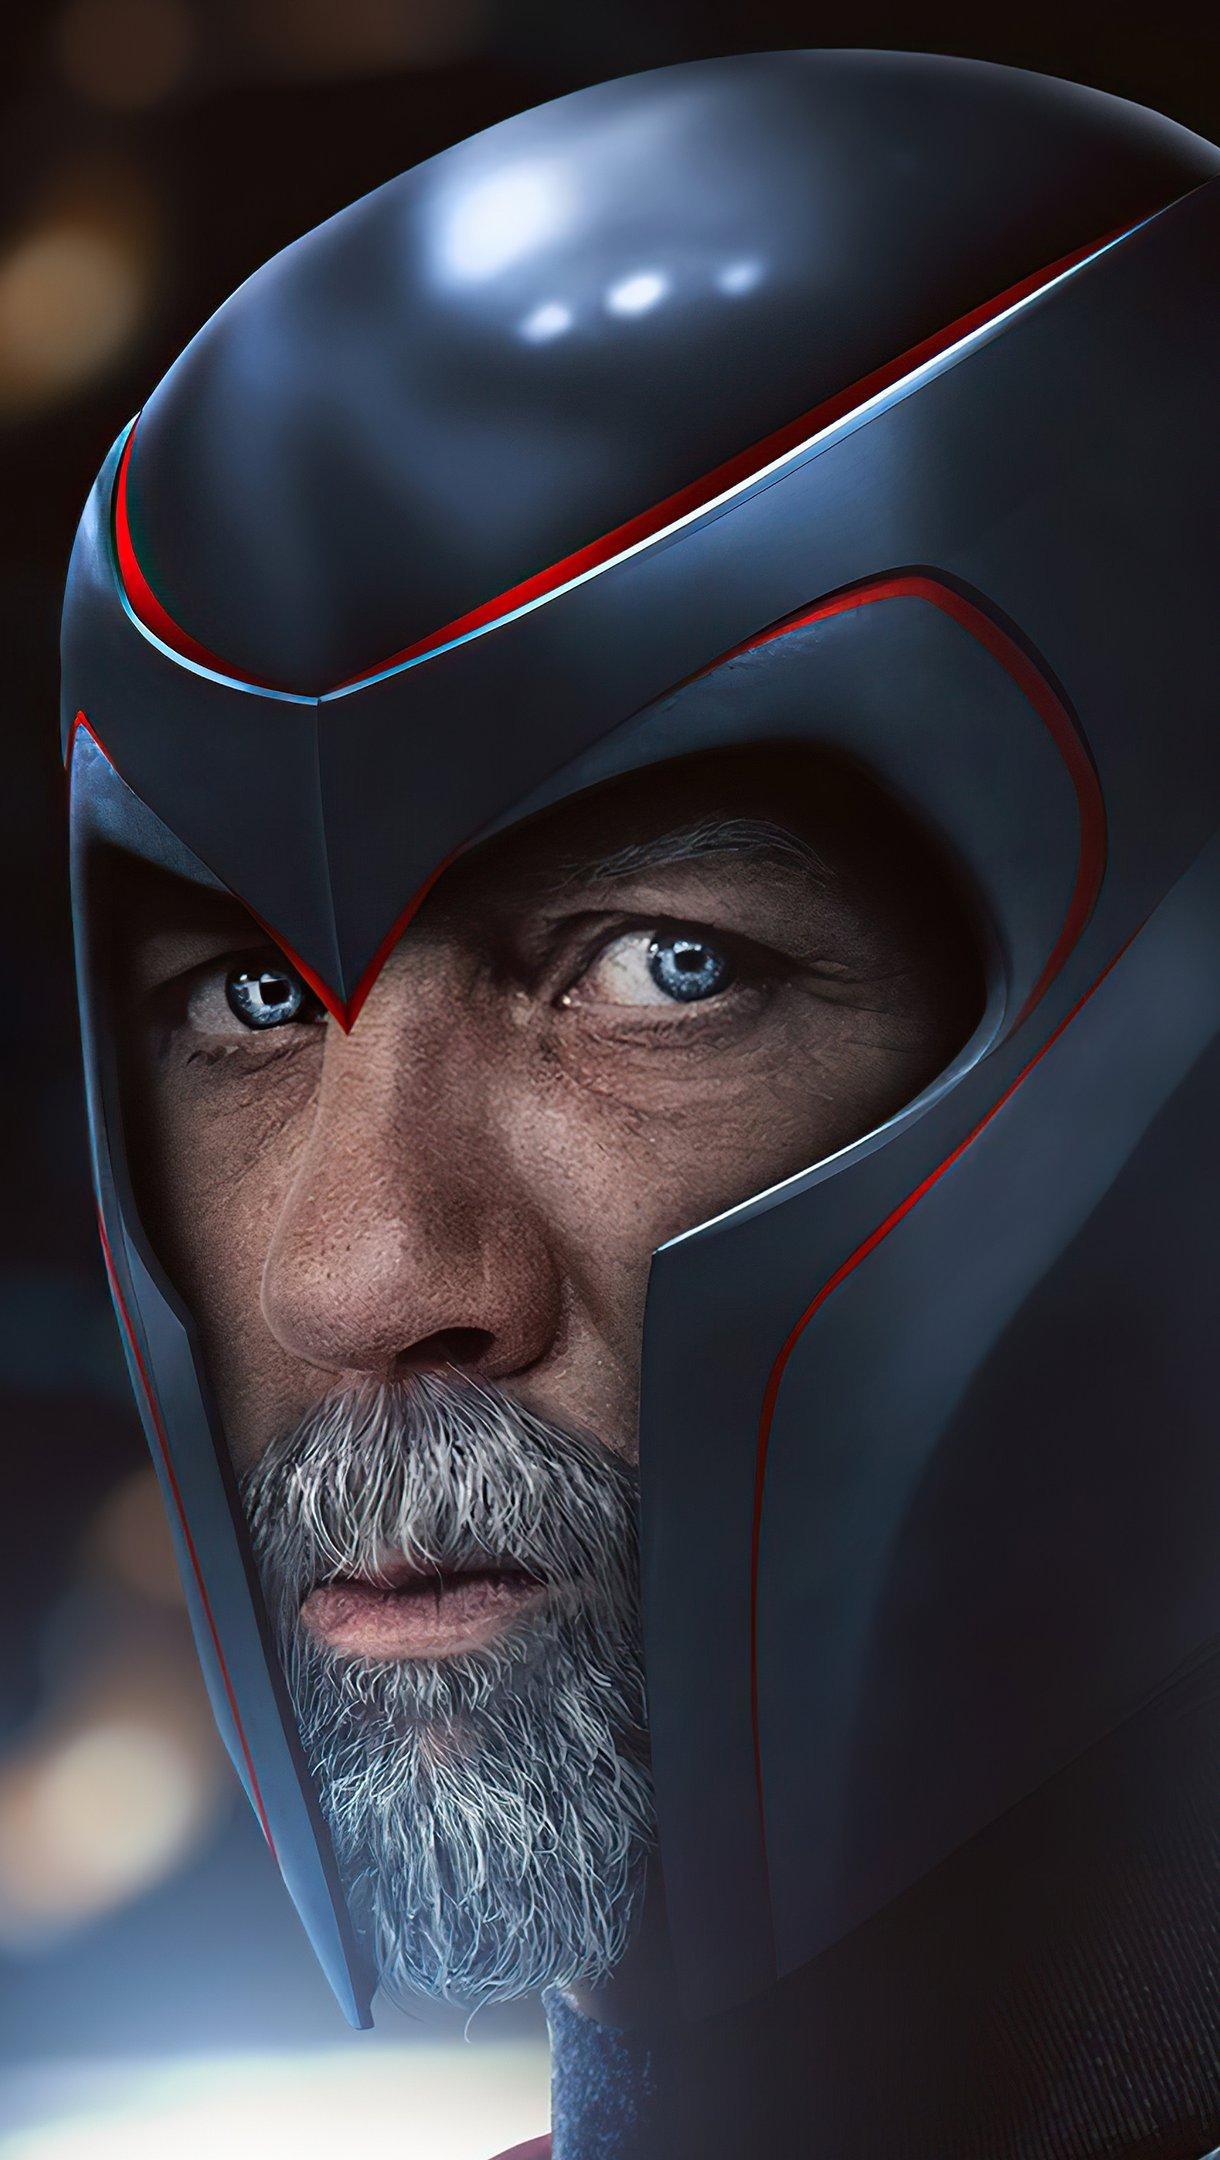 Wallpaper Daniel Graig as Magneto Xmen Vertical